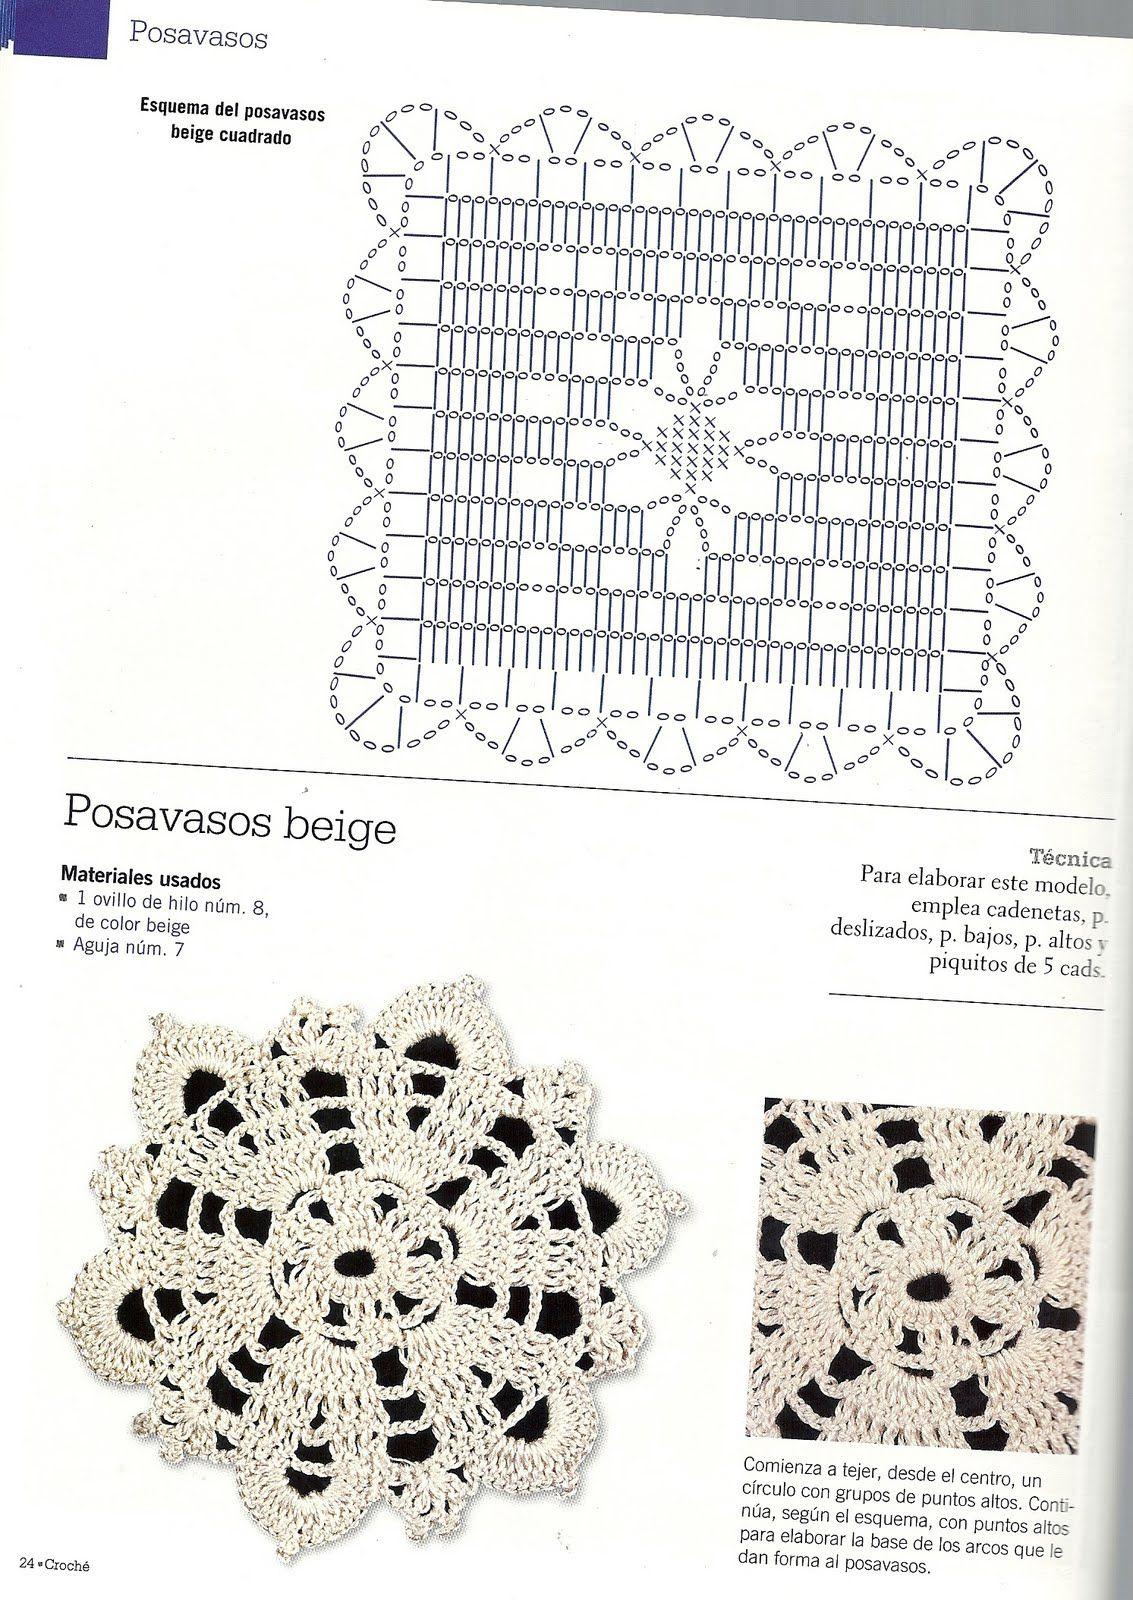 View image: 90 (13) | posa vasos | Pinterest | Vasos, Tutoriales y ...